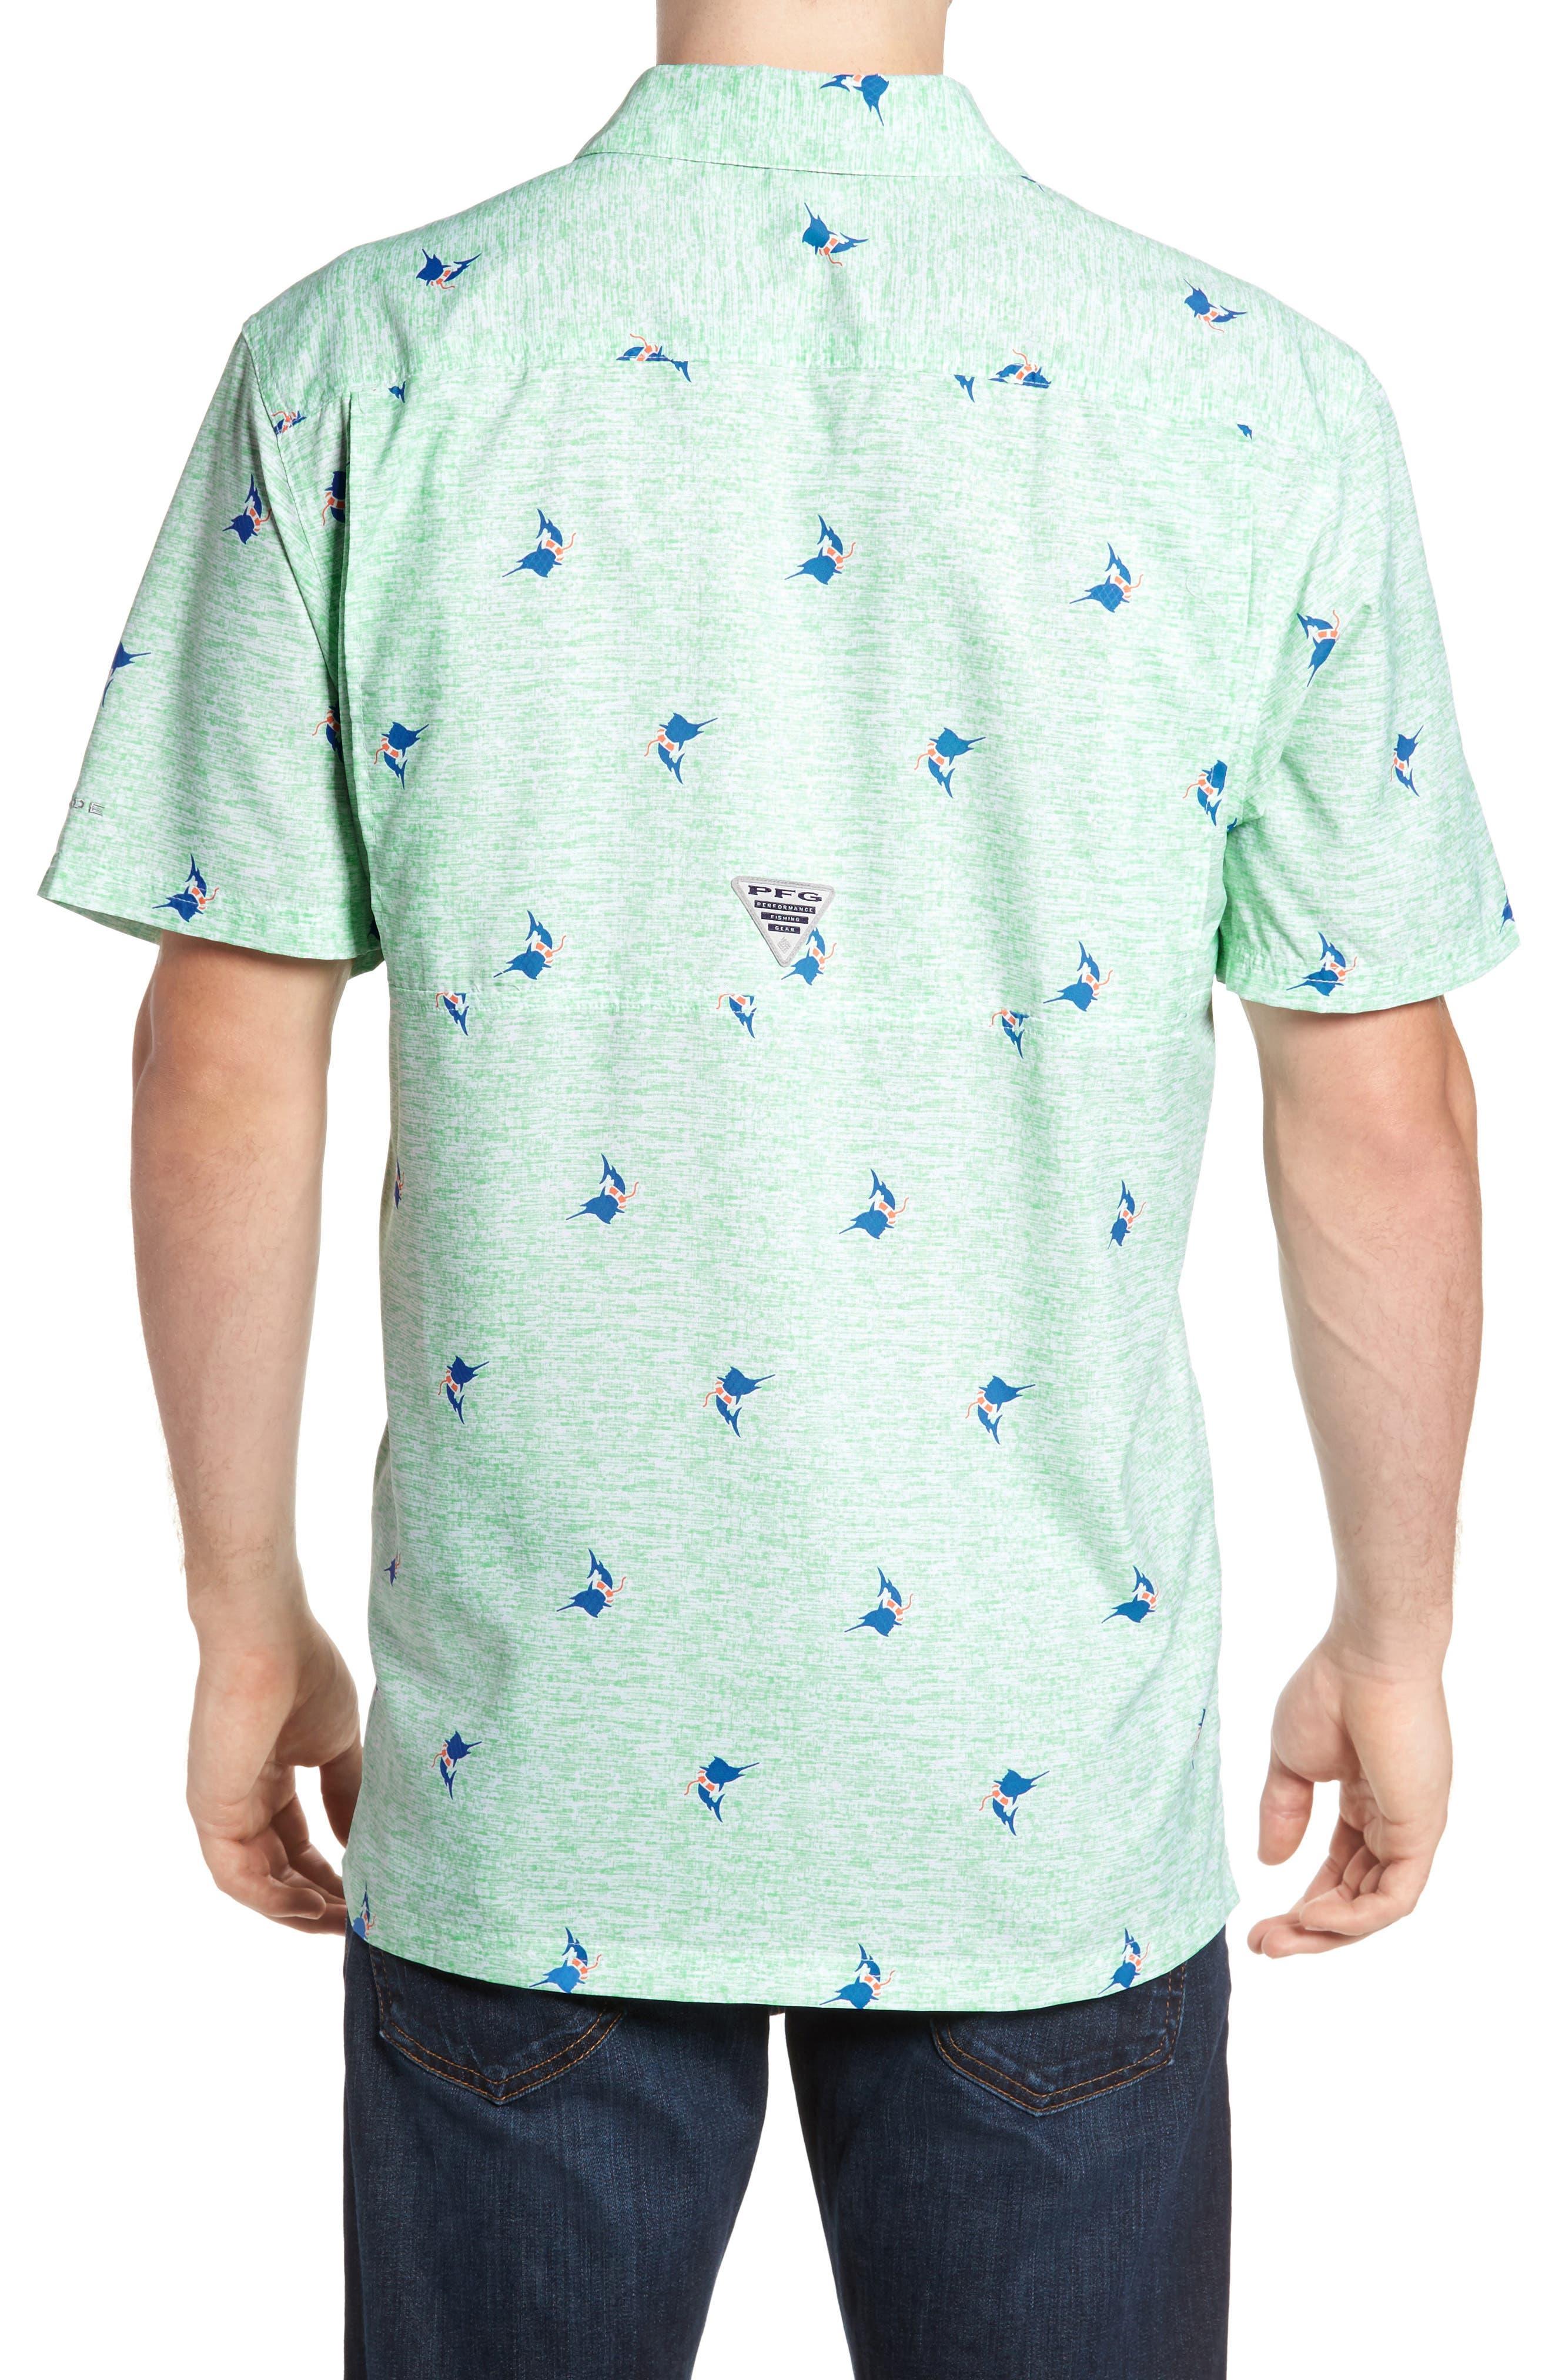 Super Slack Tide Patterned Woven Shirt,                             Alternate thumbnail 2, color,                             Kelp Marlin Print